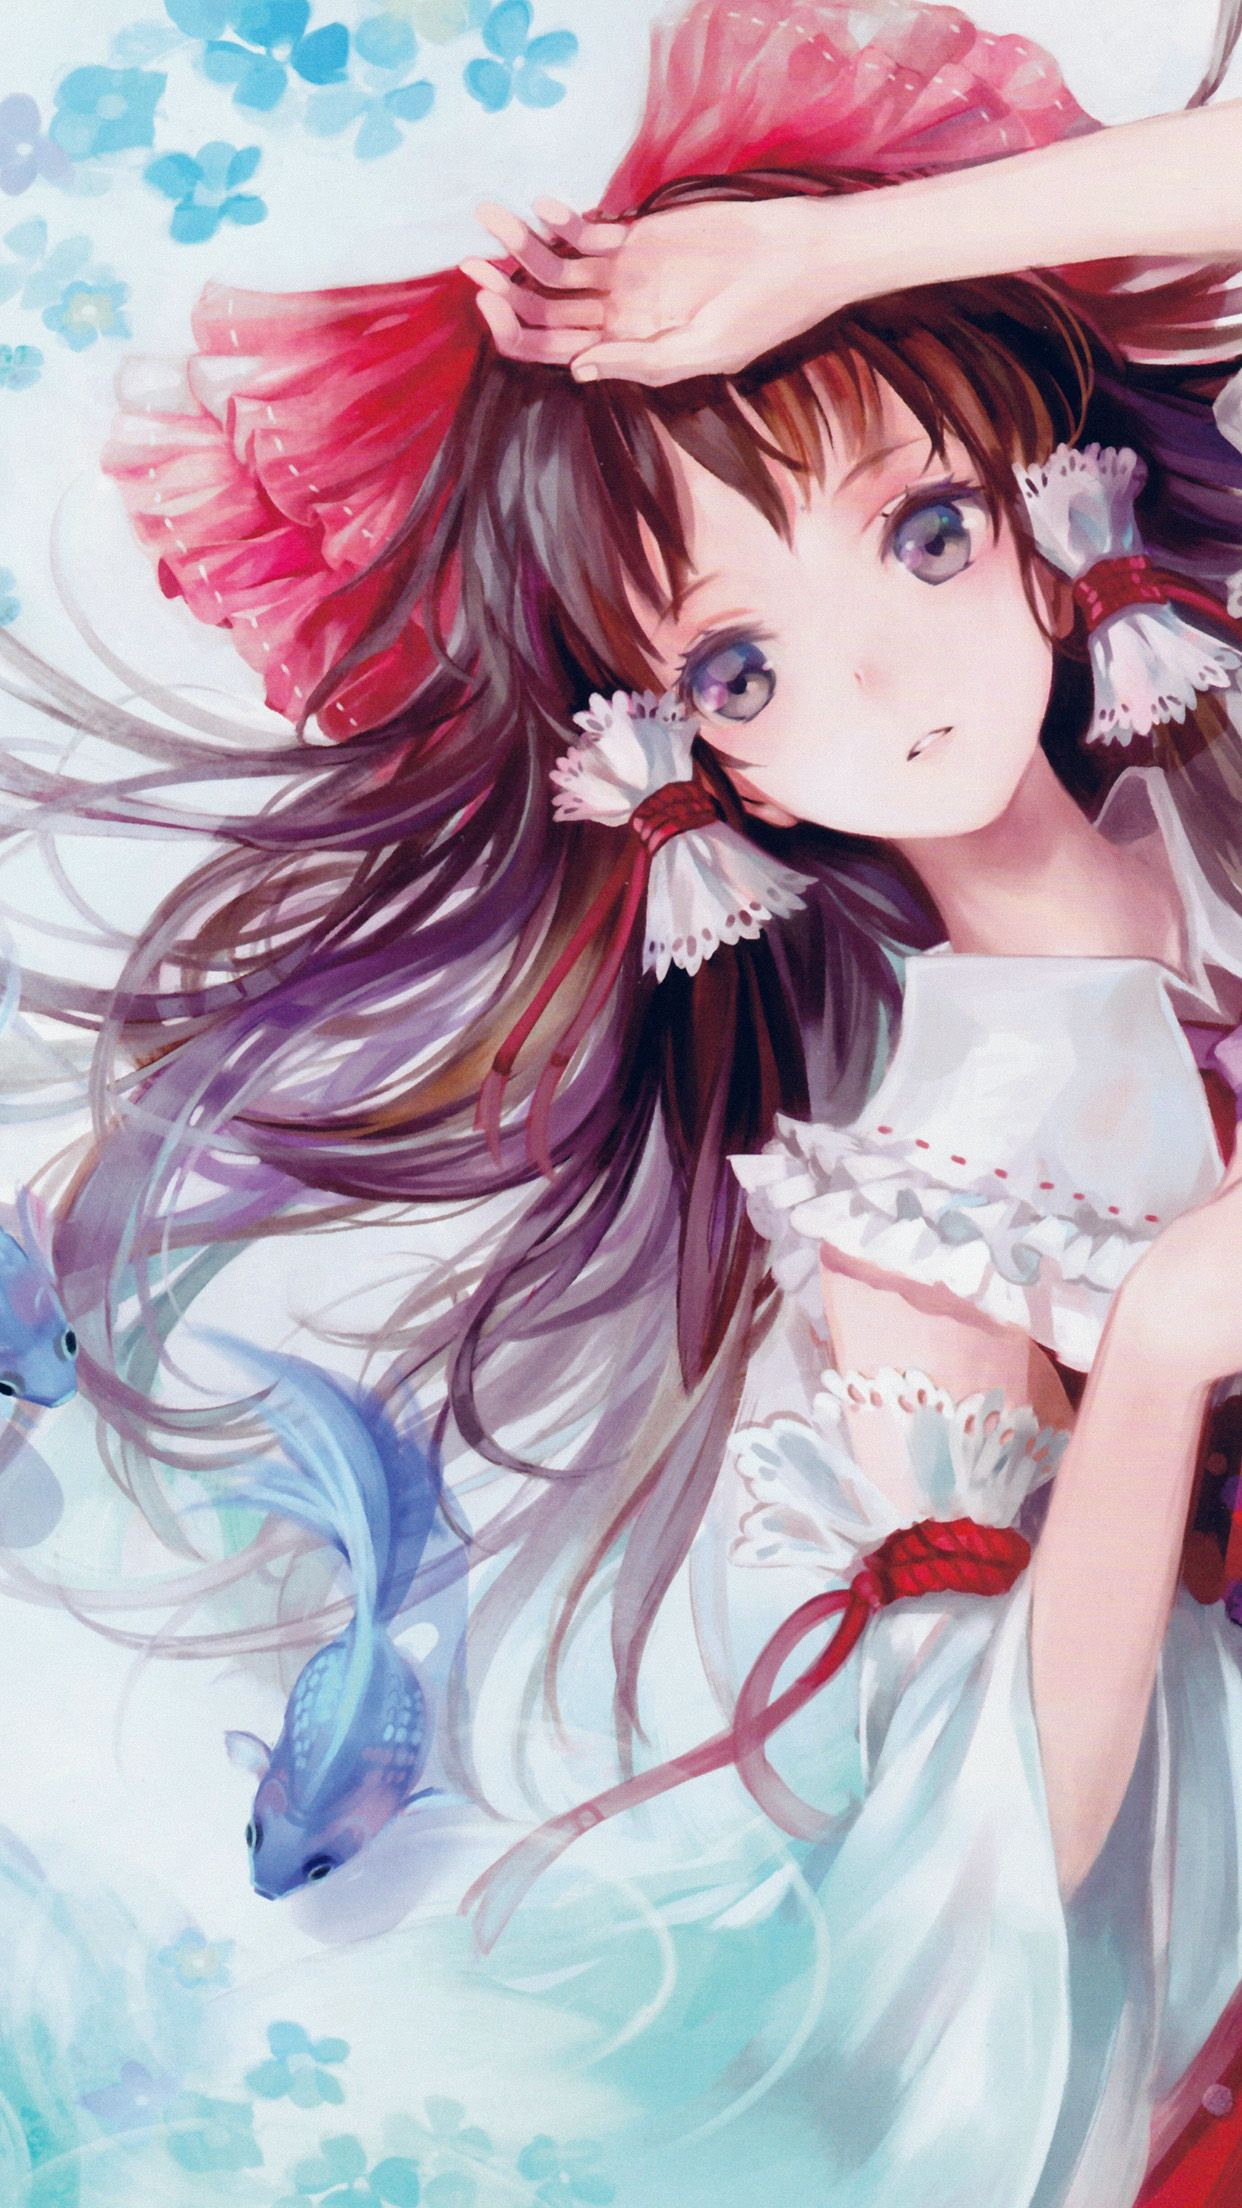 Cute Anime Girl Wallpaper Iphone : anime, wallpaper, iphone, Iphone, Pretty, Anime, Wallpaper